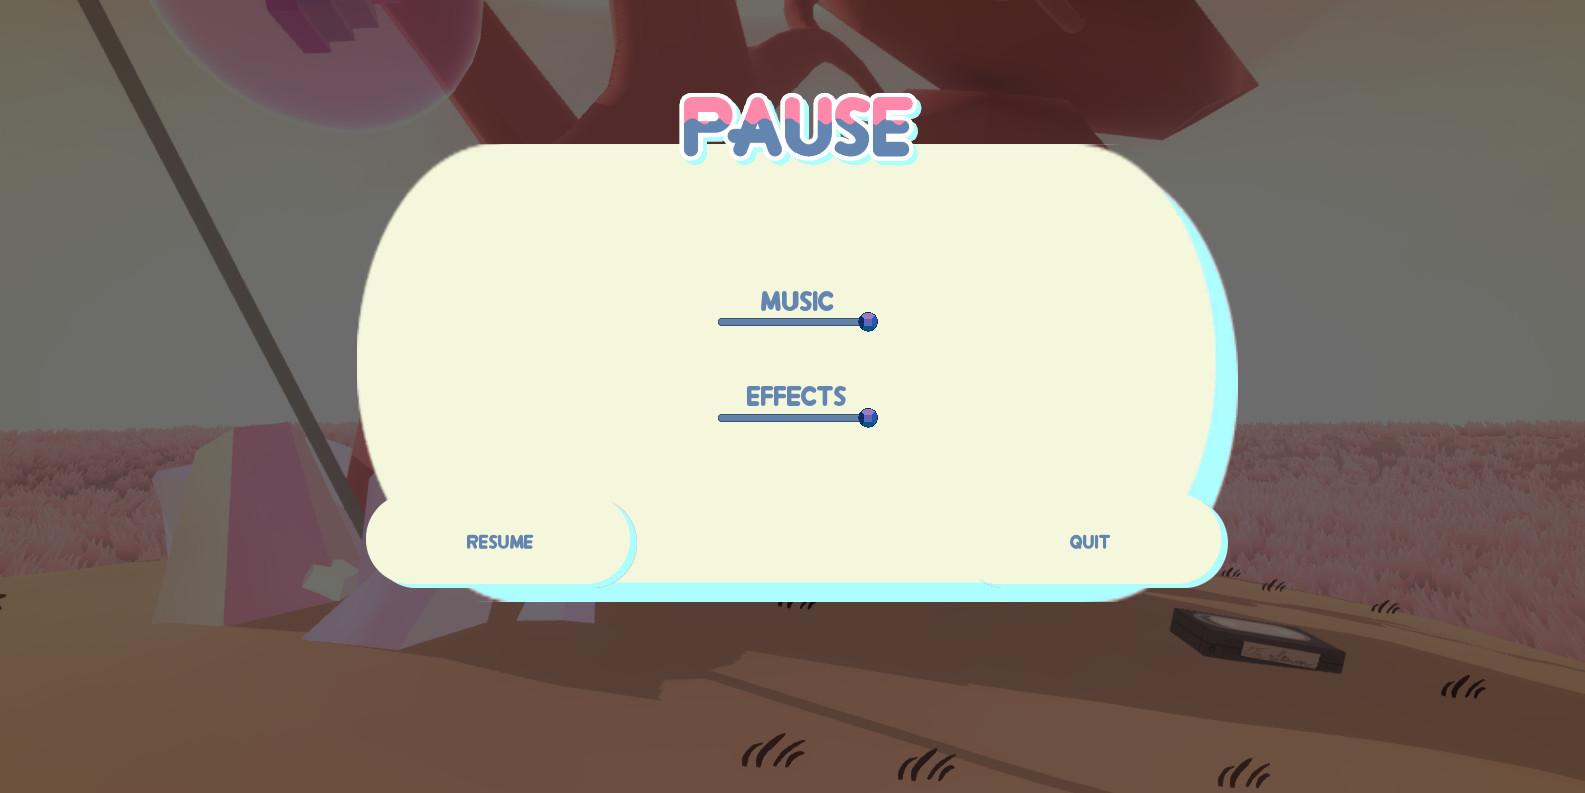 Pause Menu Design